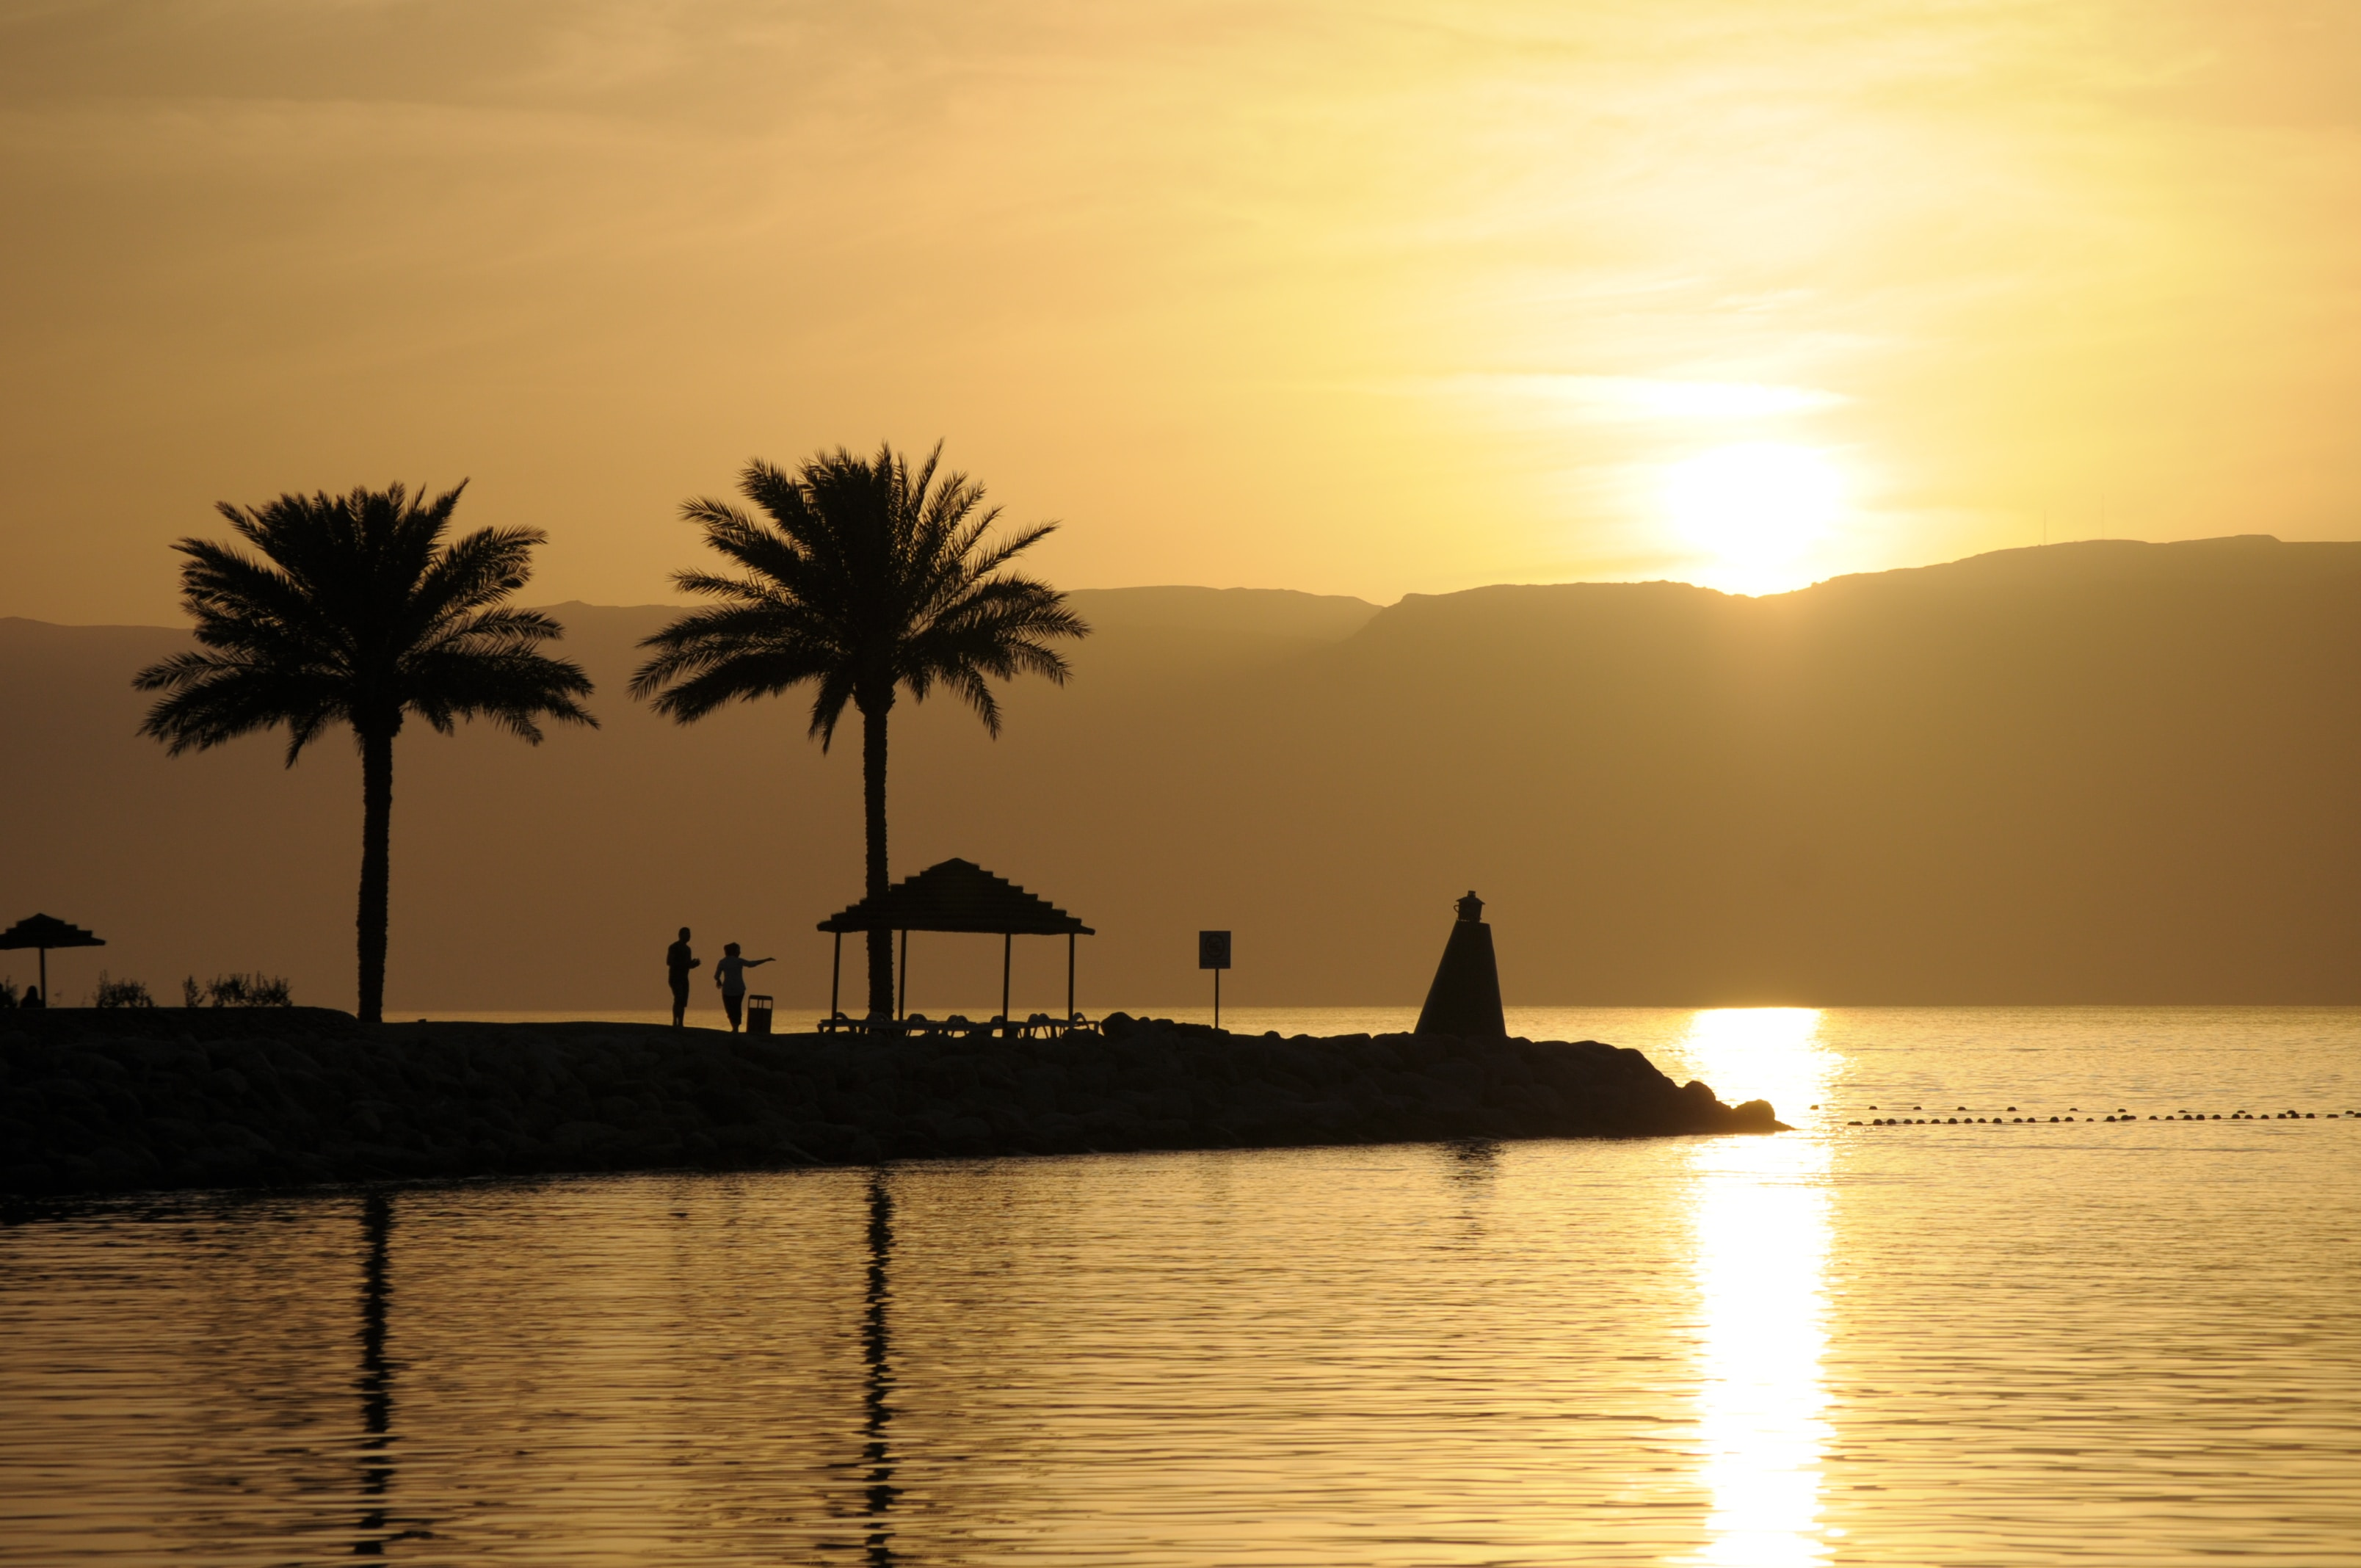 Aqaba-Seafront-Jordan.jpg?1565130408